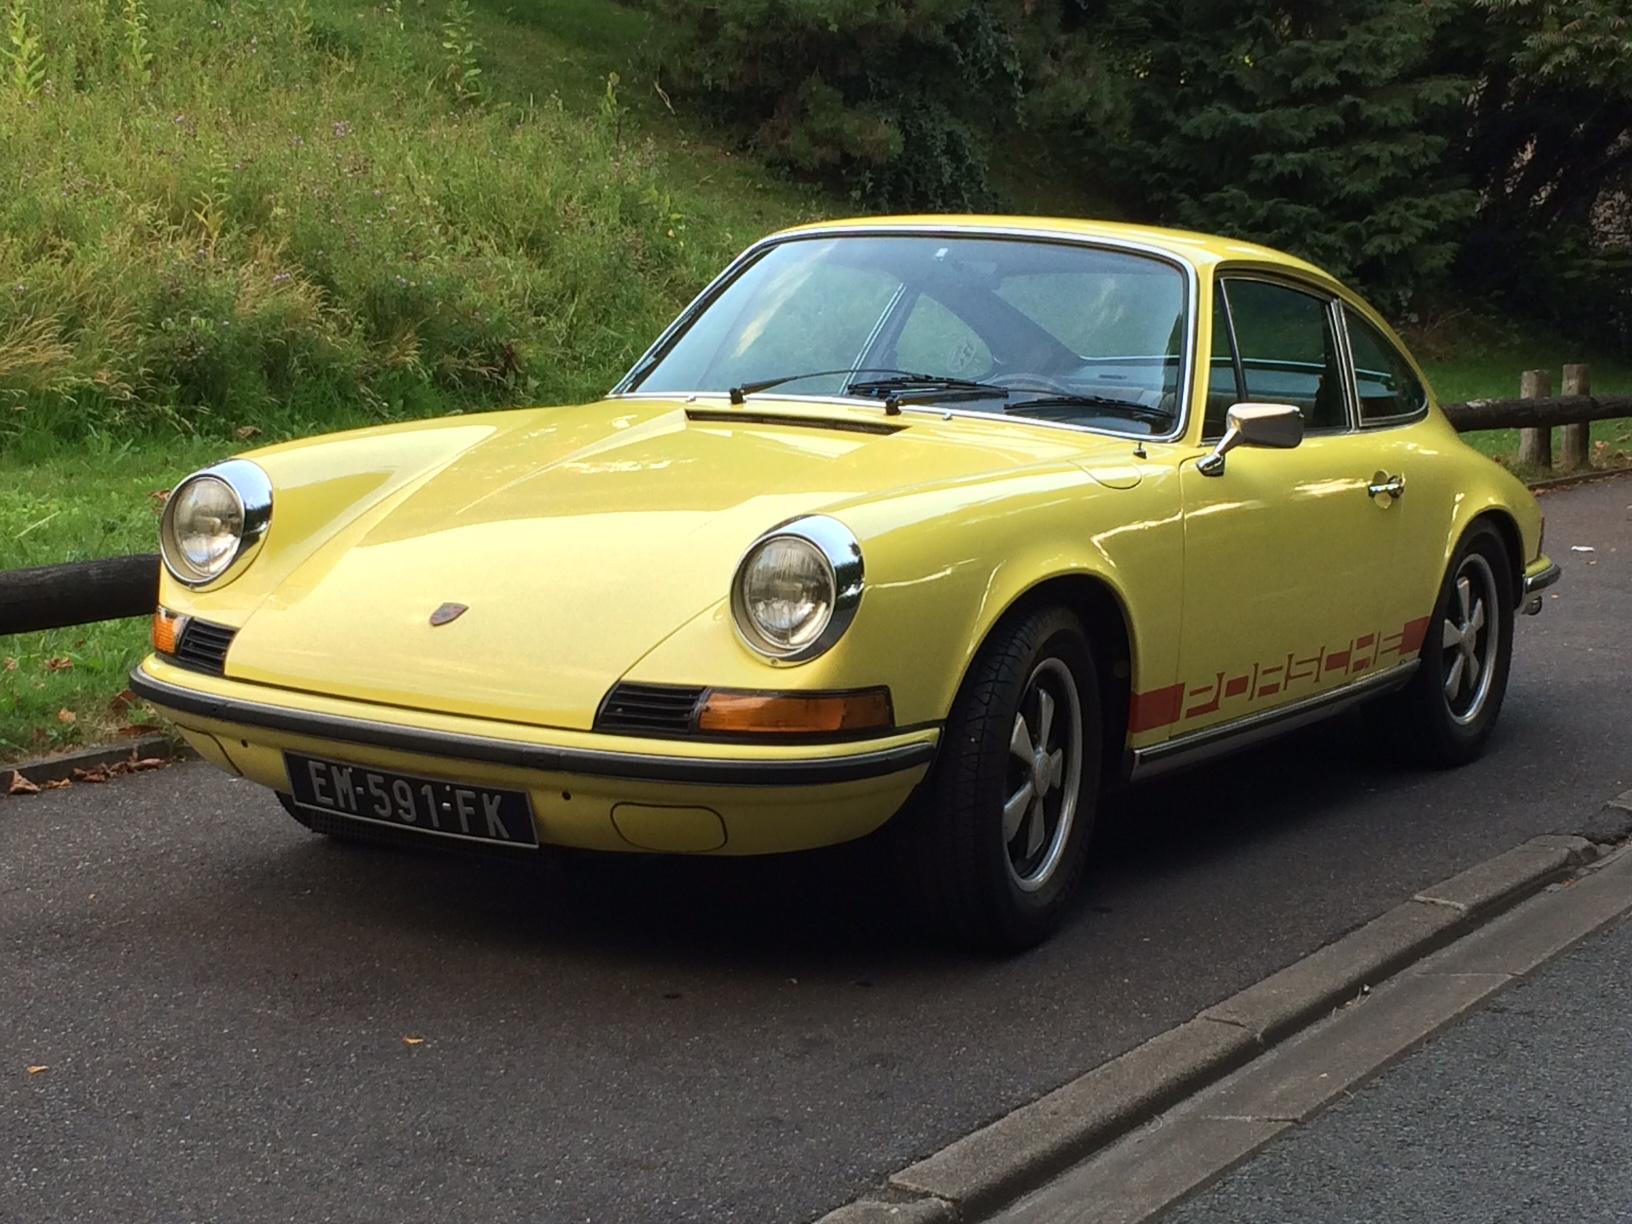 Porsche9112.4TE197305313.JPG